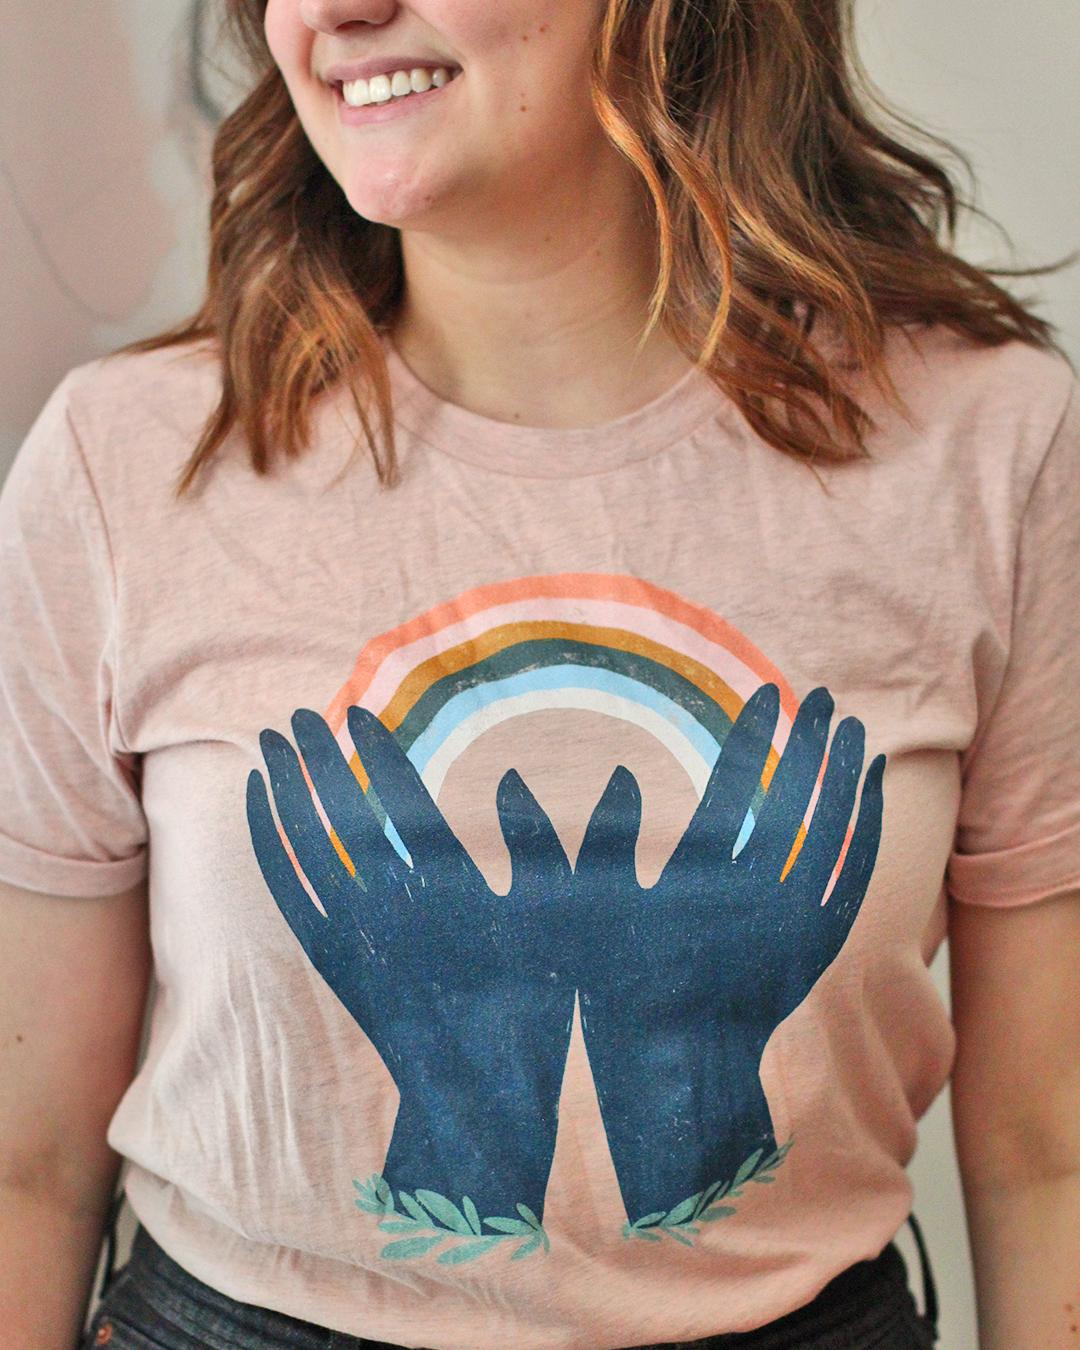 Women of Illustration_Madeline Martinez_Rainbow Tee.png